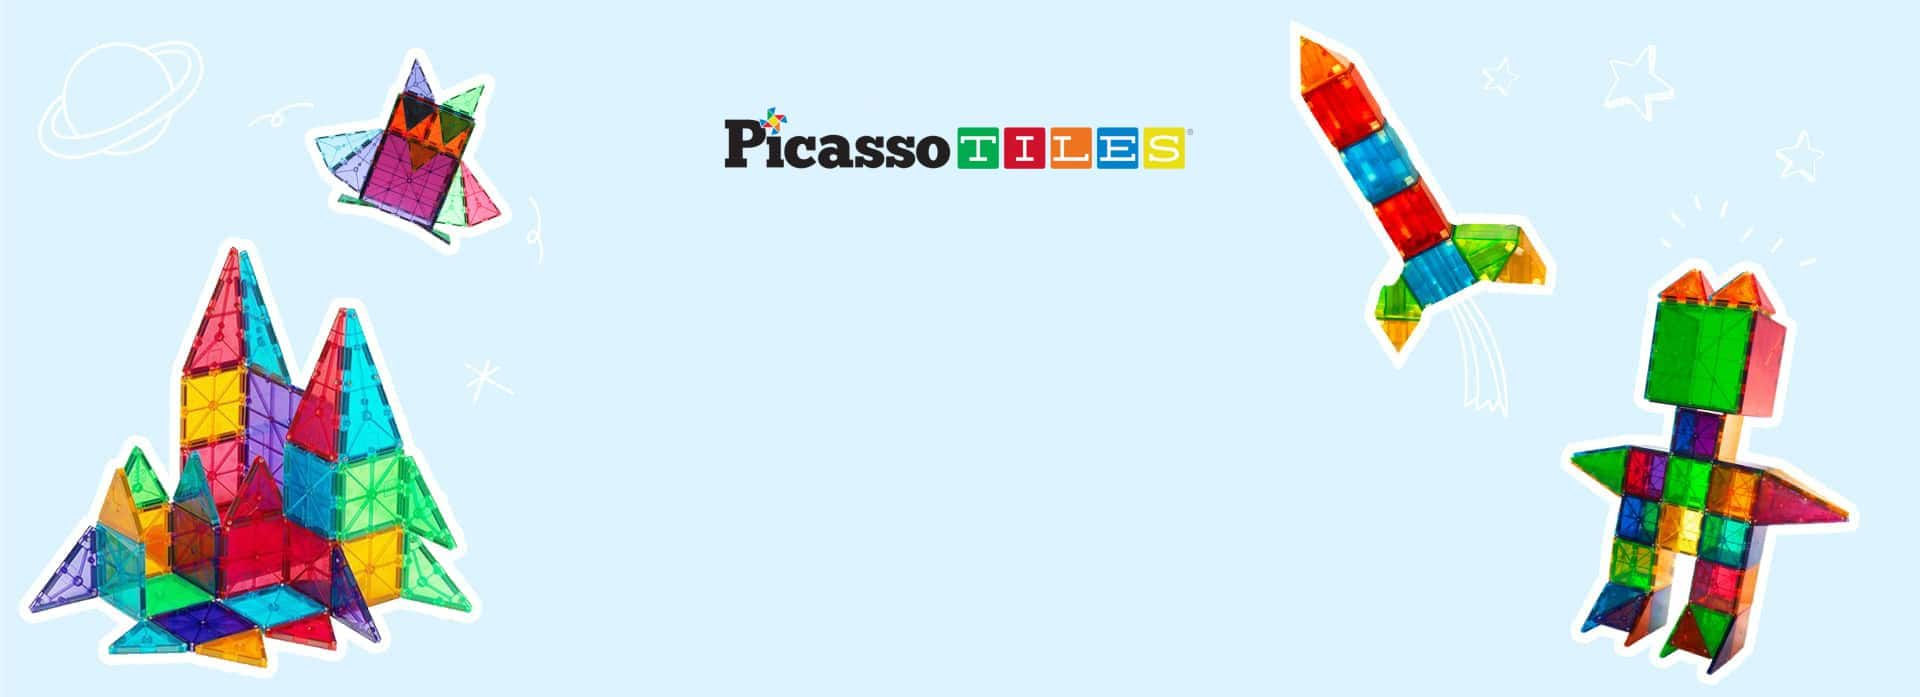 Jucării PicassoTiles